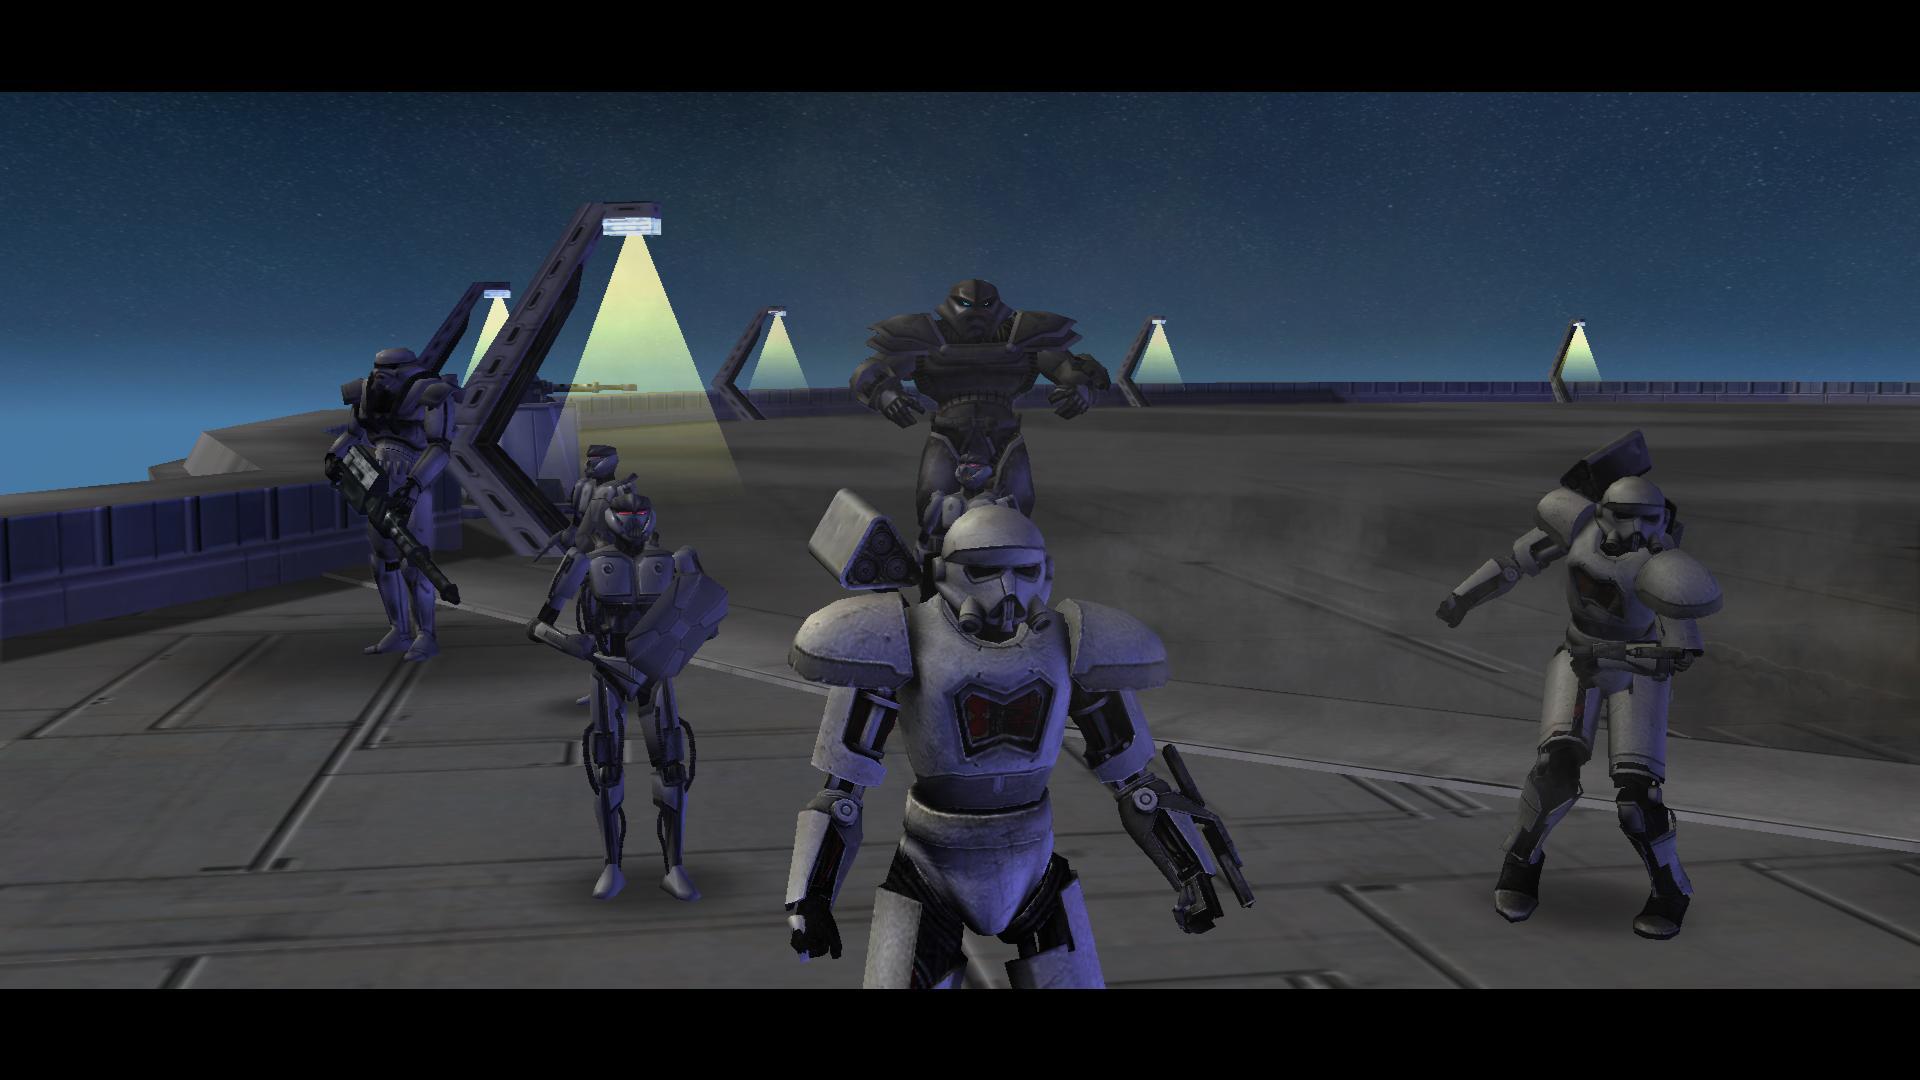 Medical droid | Wookieepedia | FANDOM powered by Wikia